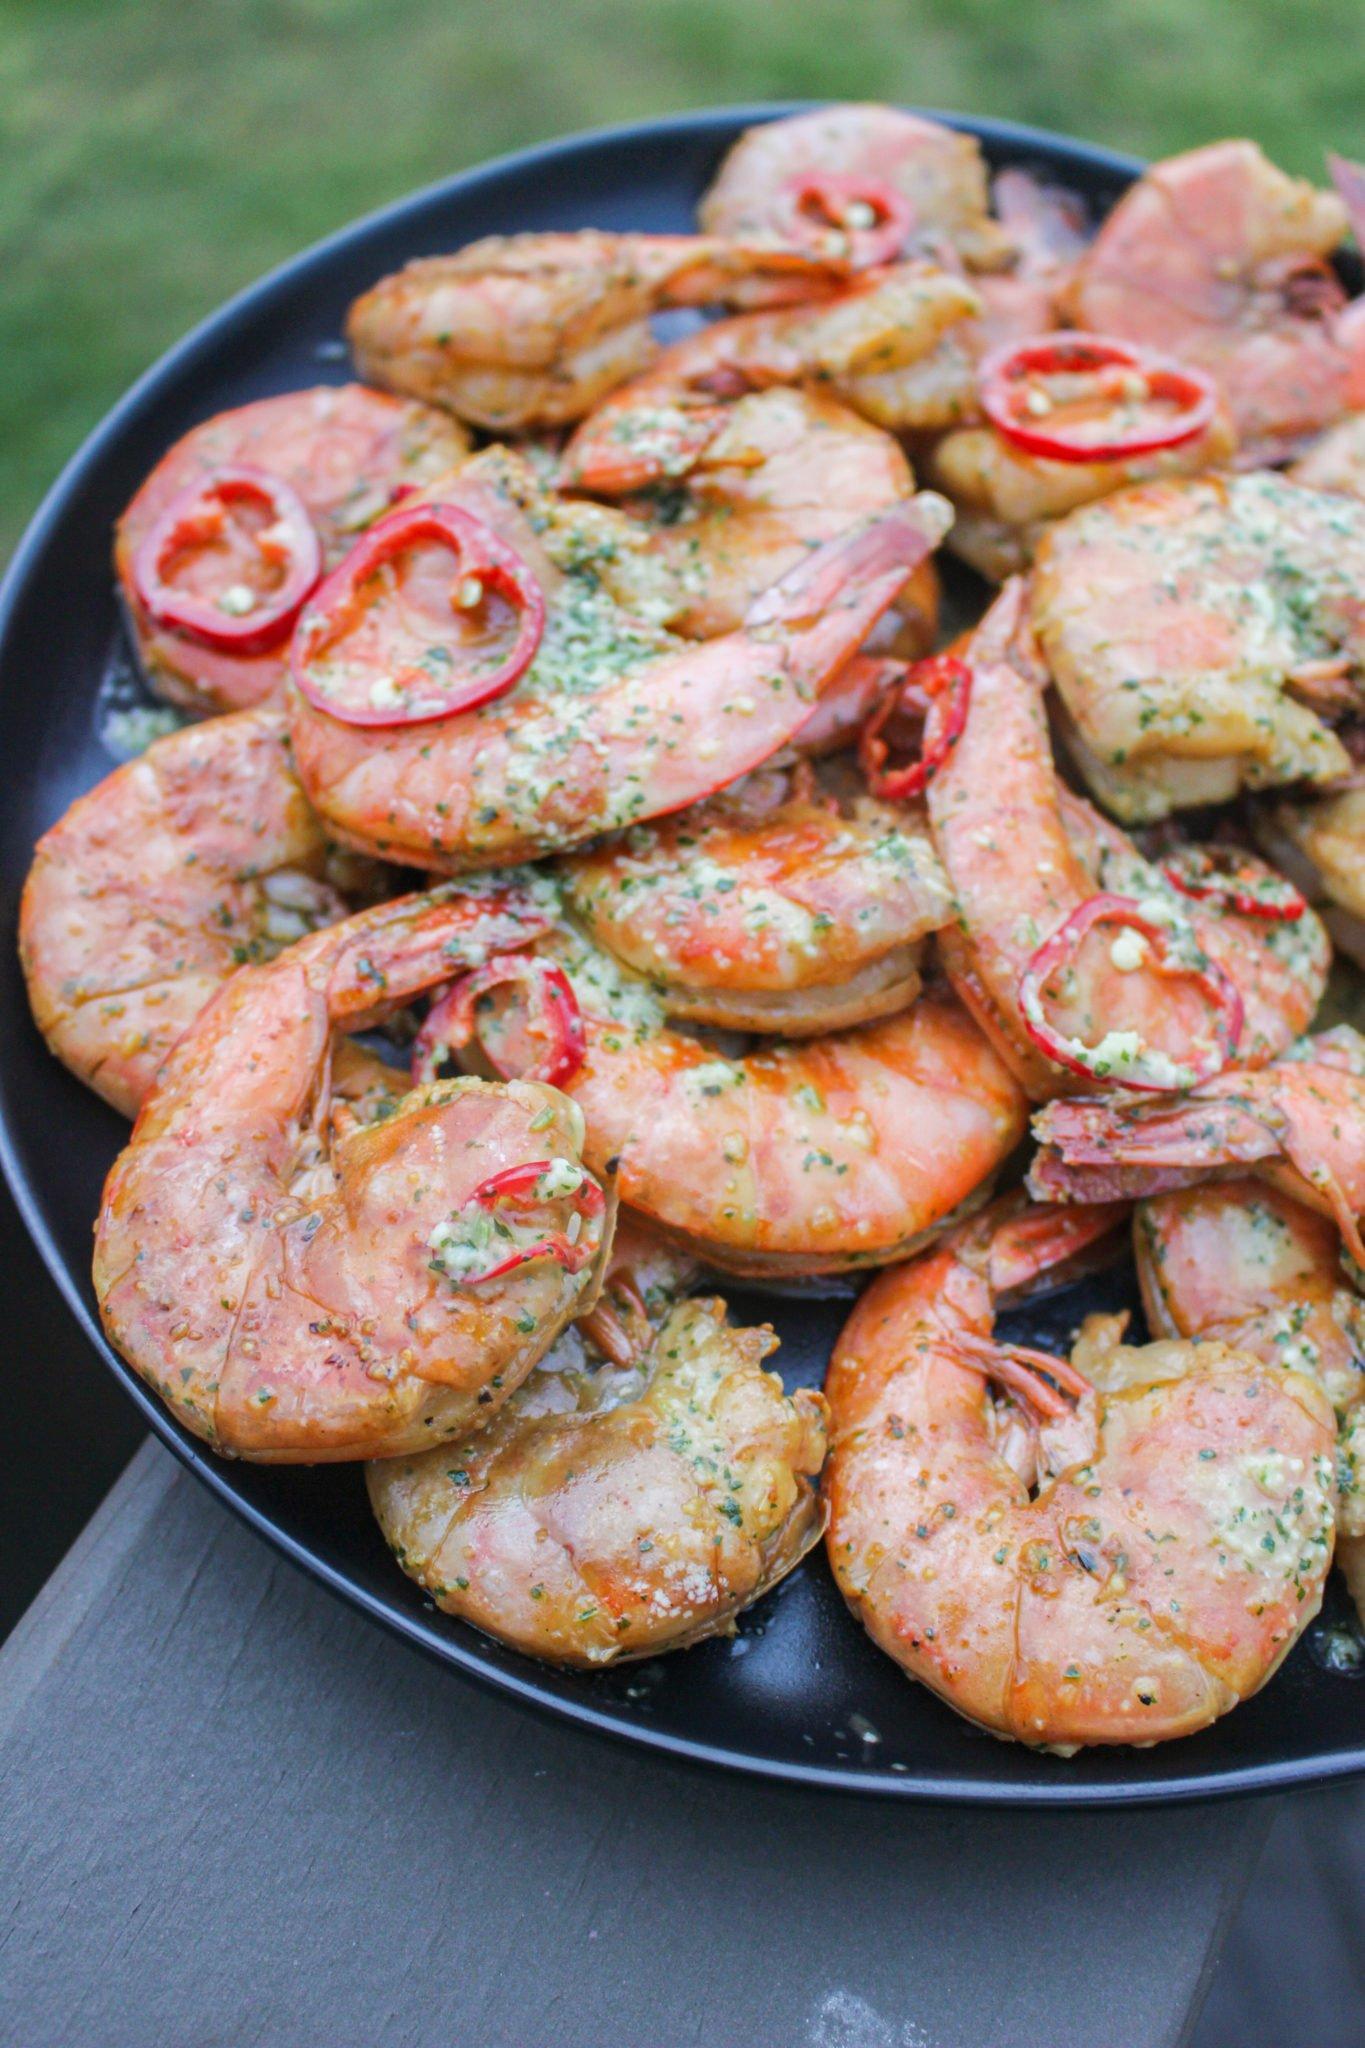 Grilled Shrimp with Garlic Chile Vinaigrette